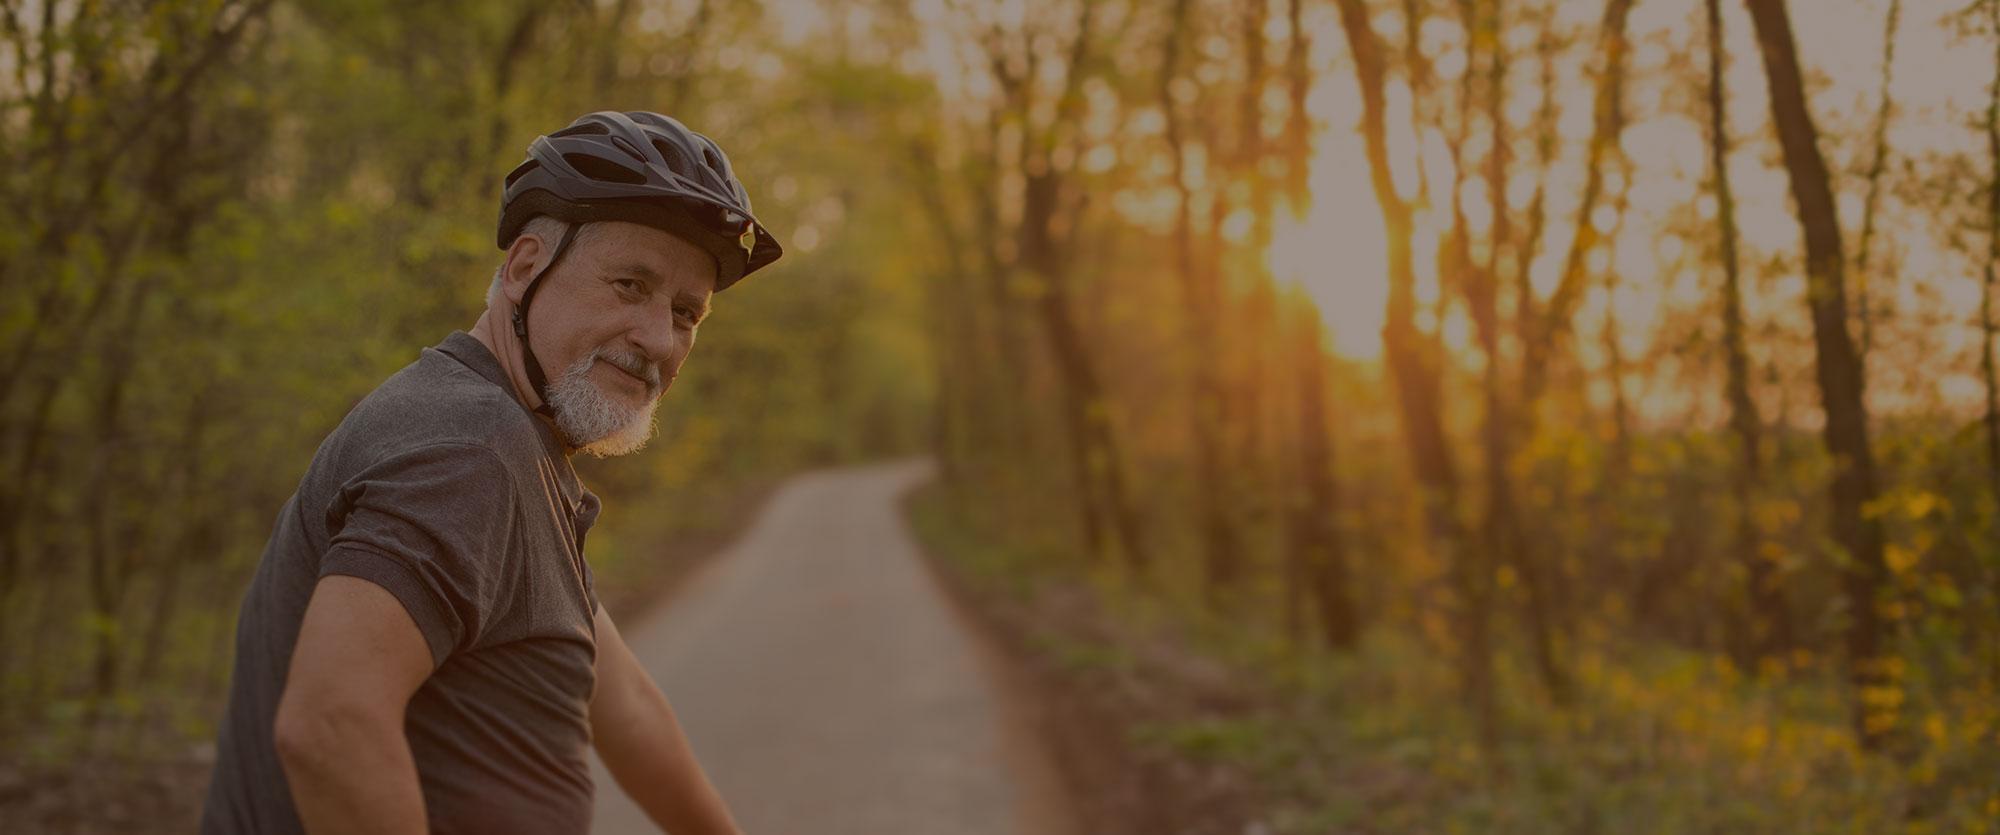 Man biking on wooded trail